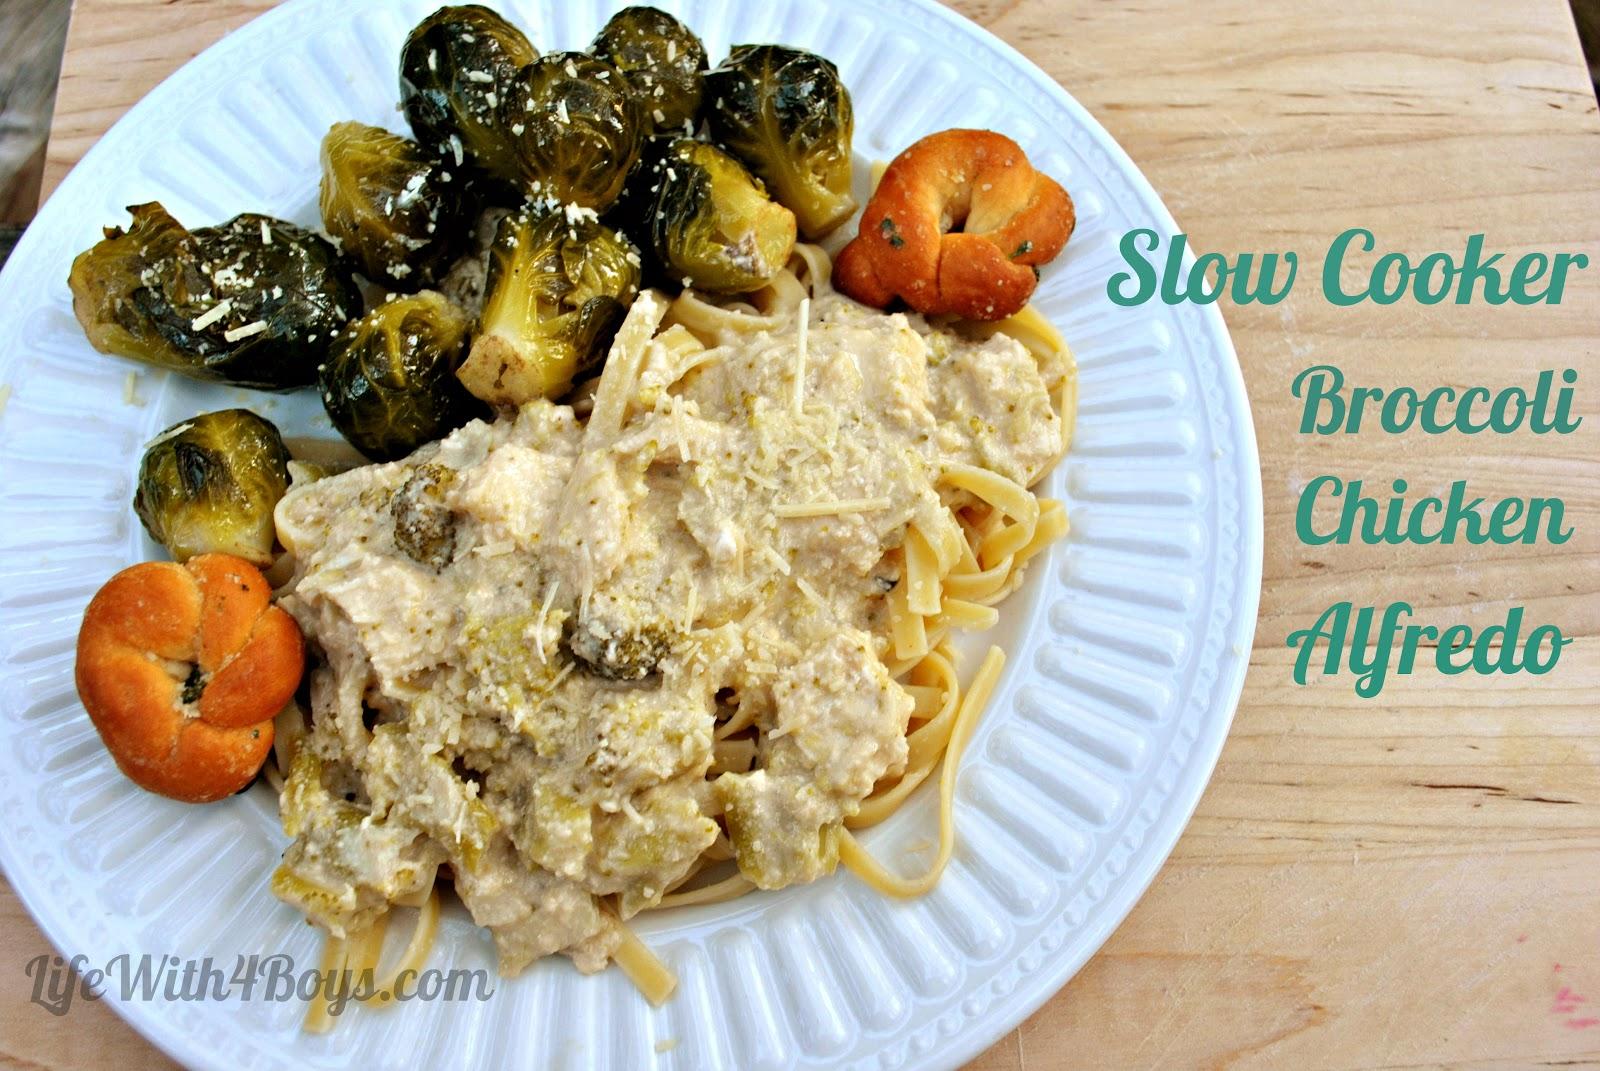 ... slow cooker broccoli chicken alfredo slow cooker chicken alfredo